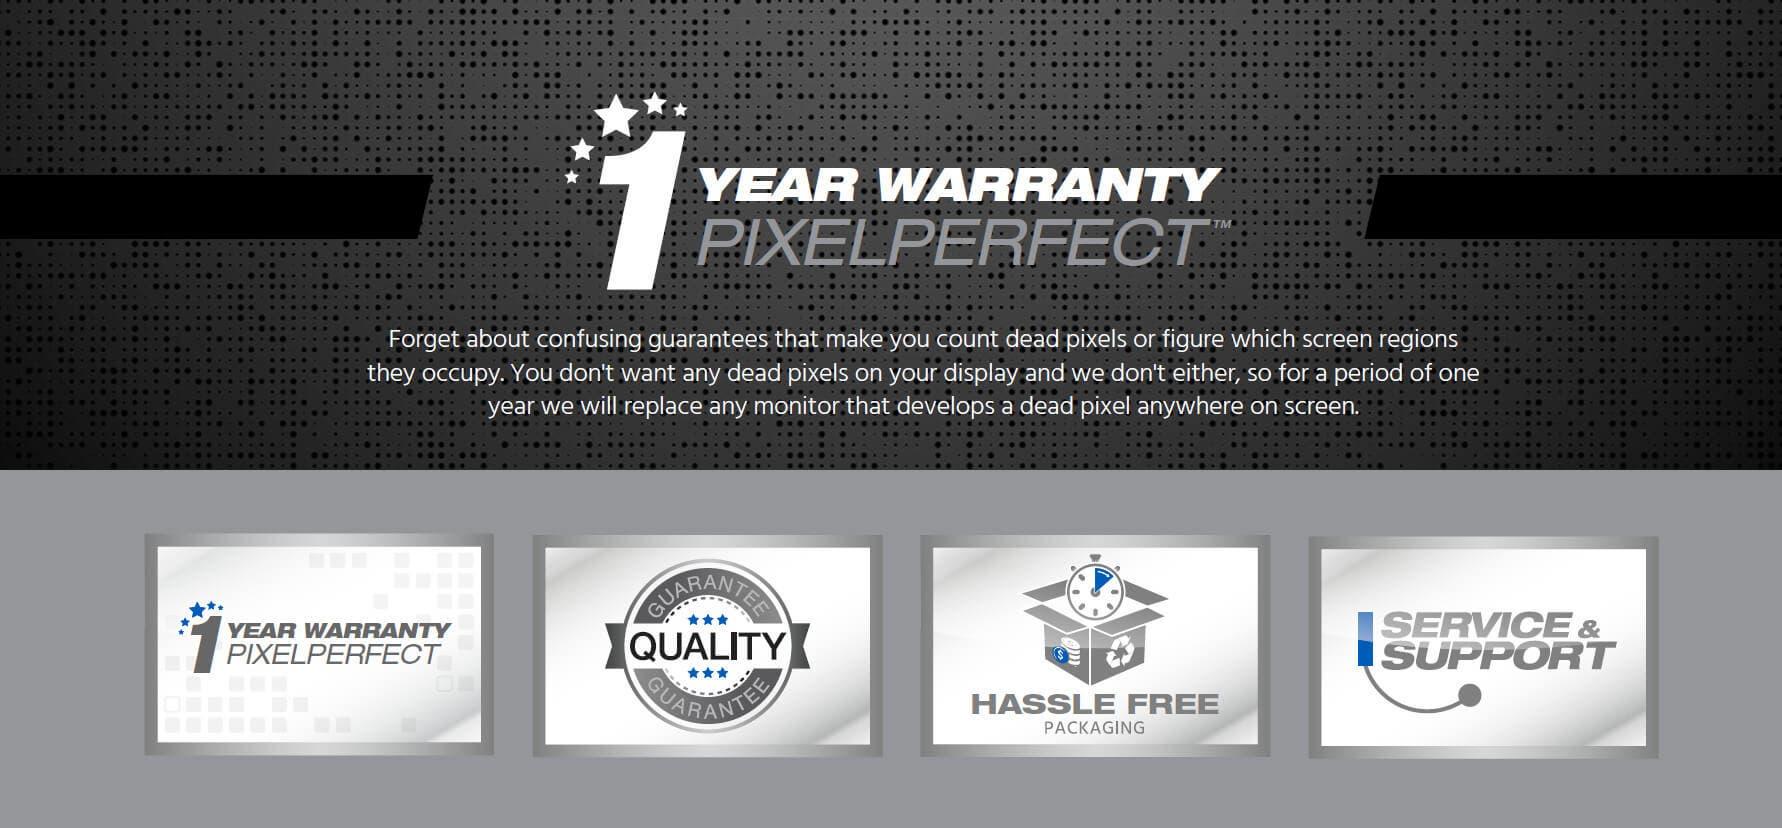 PixelPerfect Warranty